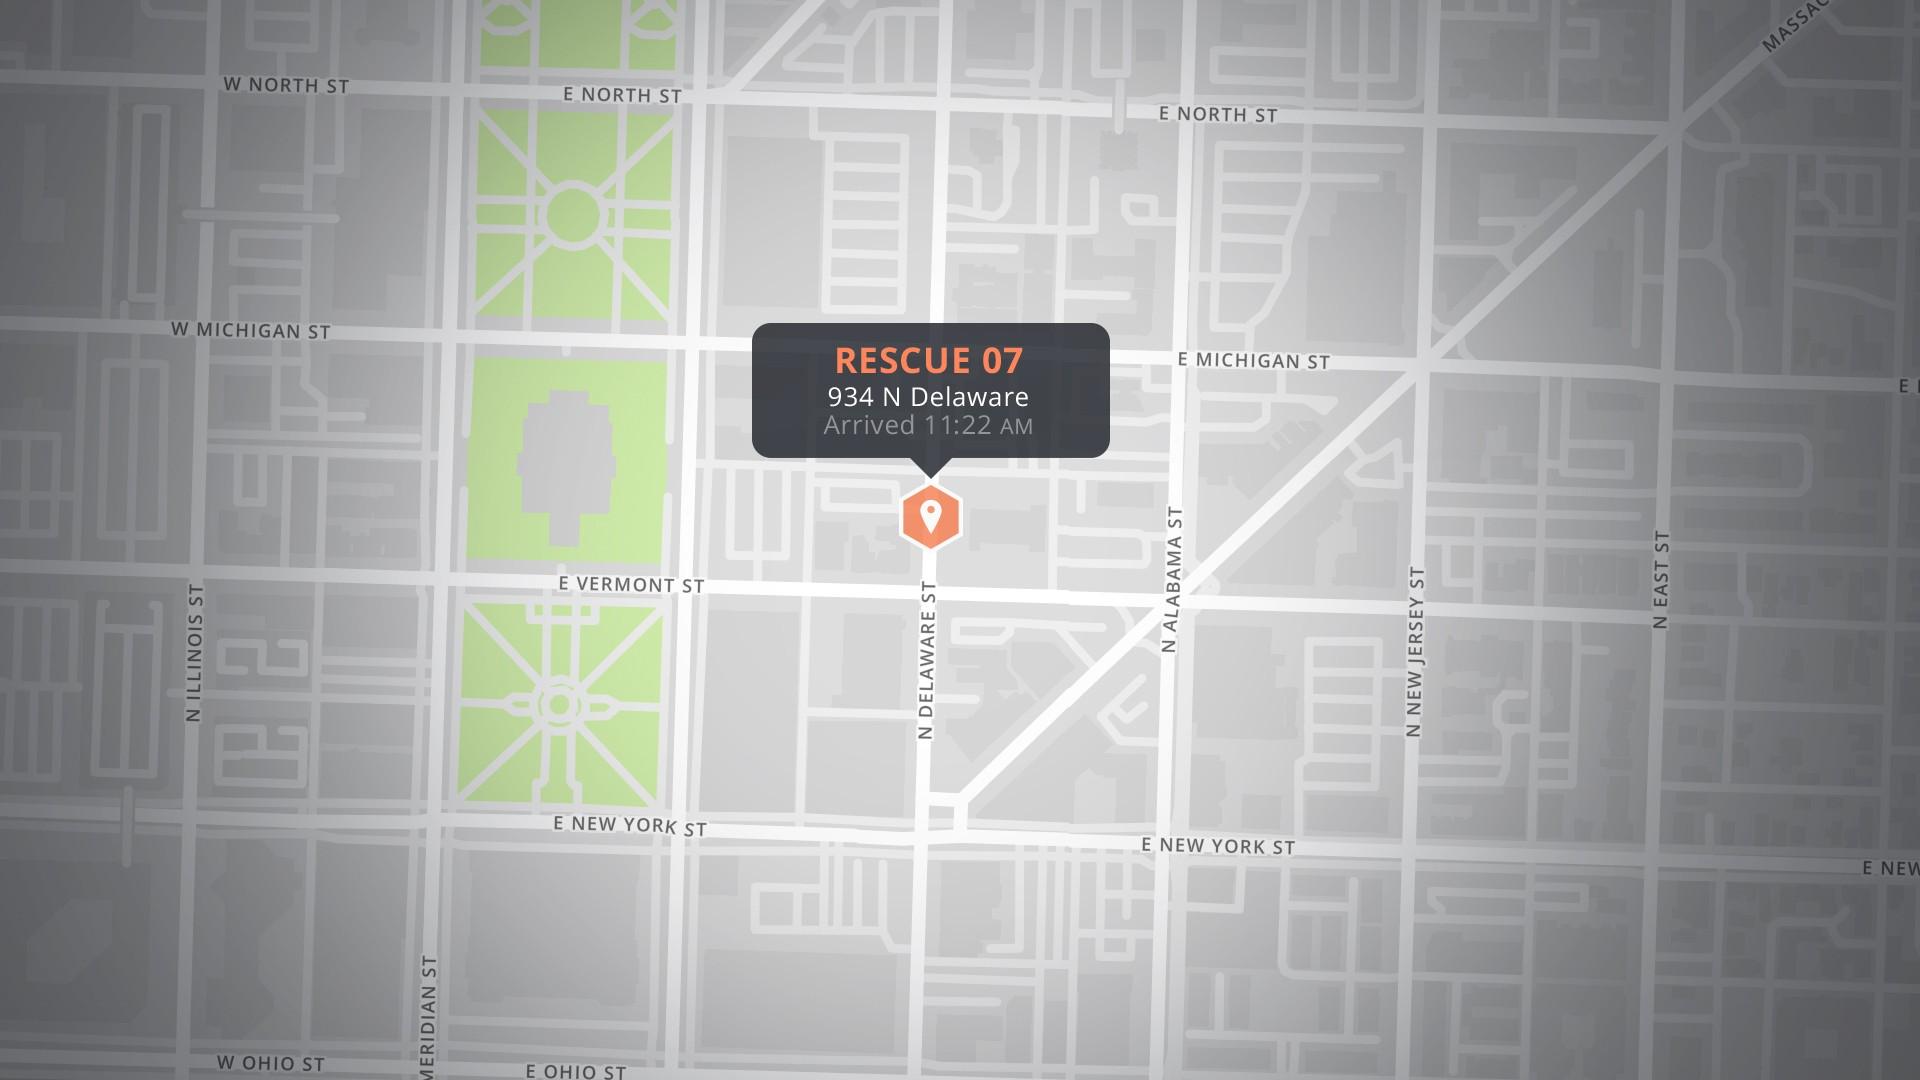 R2V communication, telematics, first responders, emergency vehicles